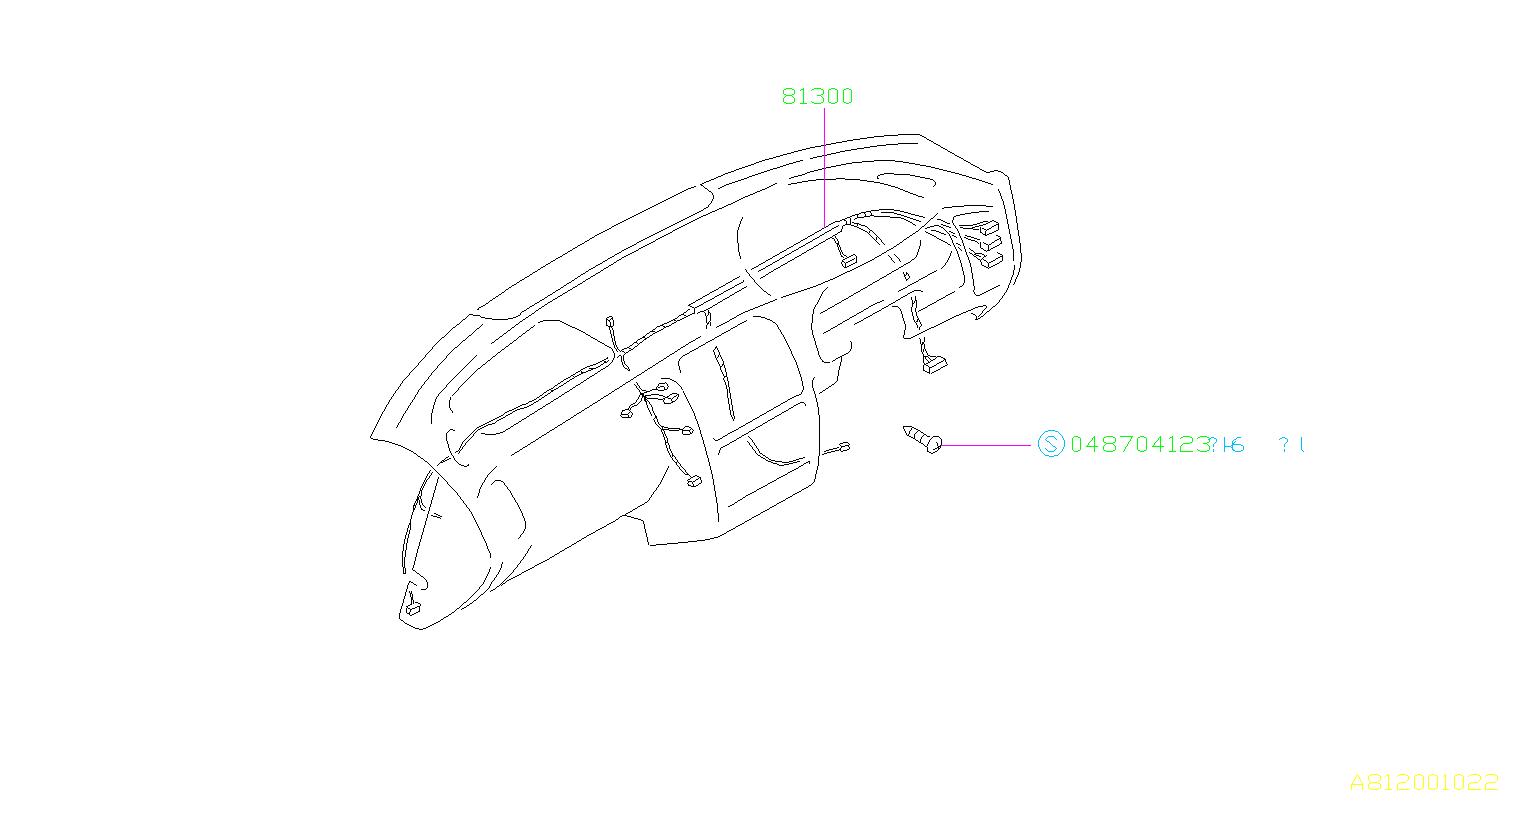 subaru legacy harness-instrument panel  out back u0u1  wiring  instrumentpanel